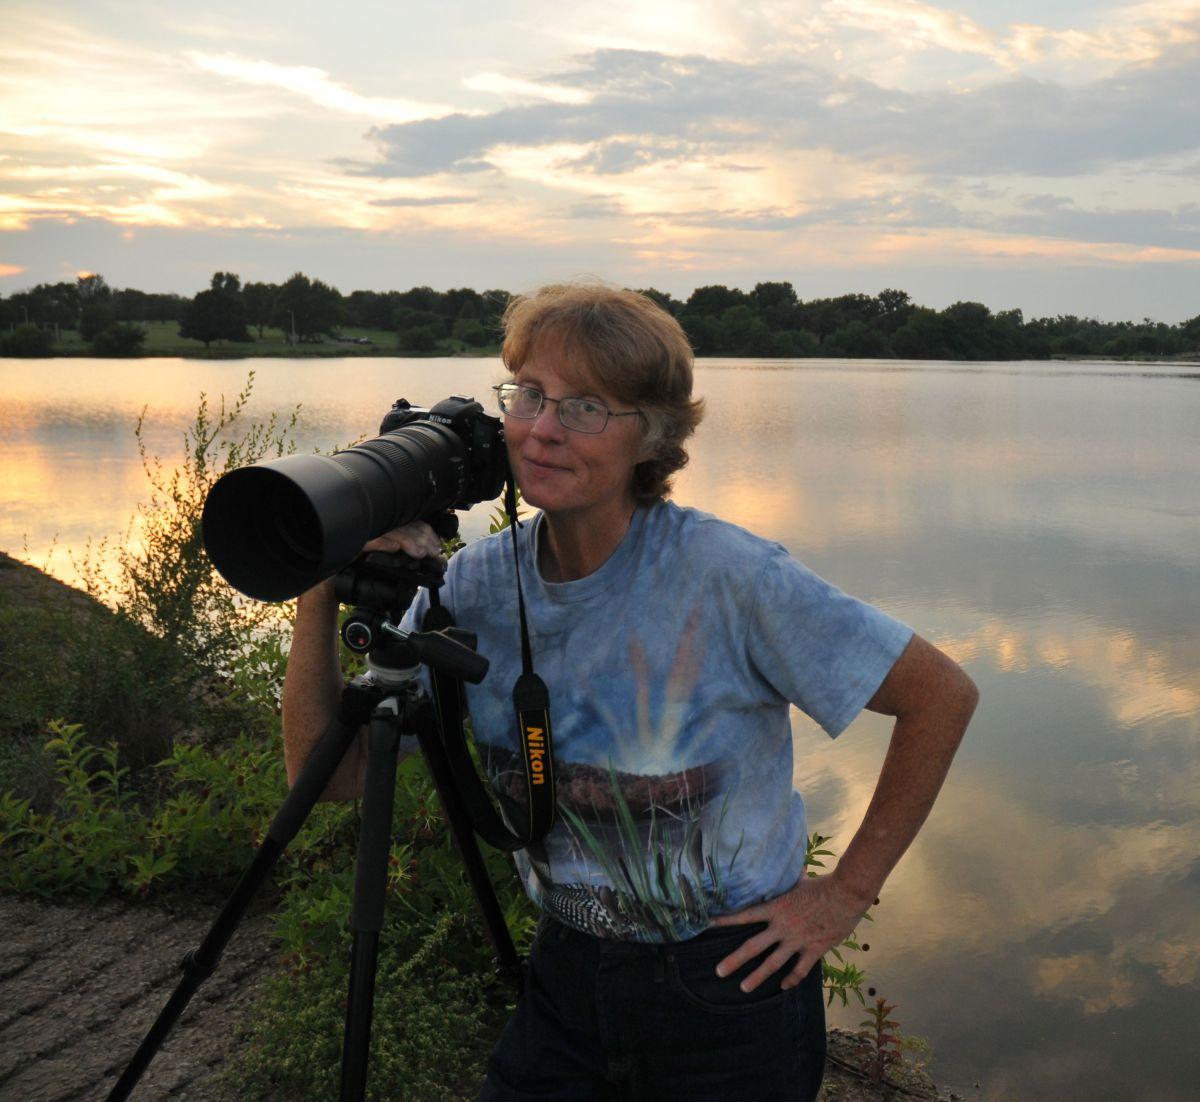 Camera Versus Binoculars, A Bird's Eye View